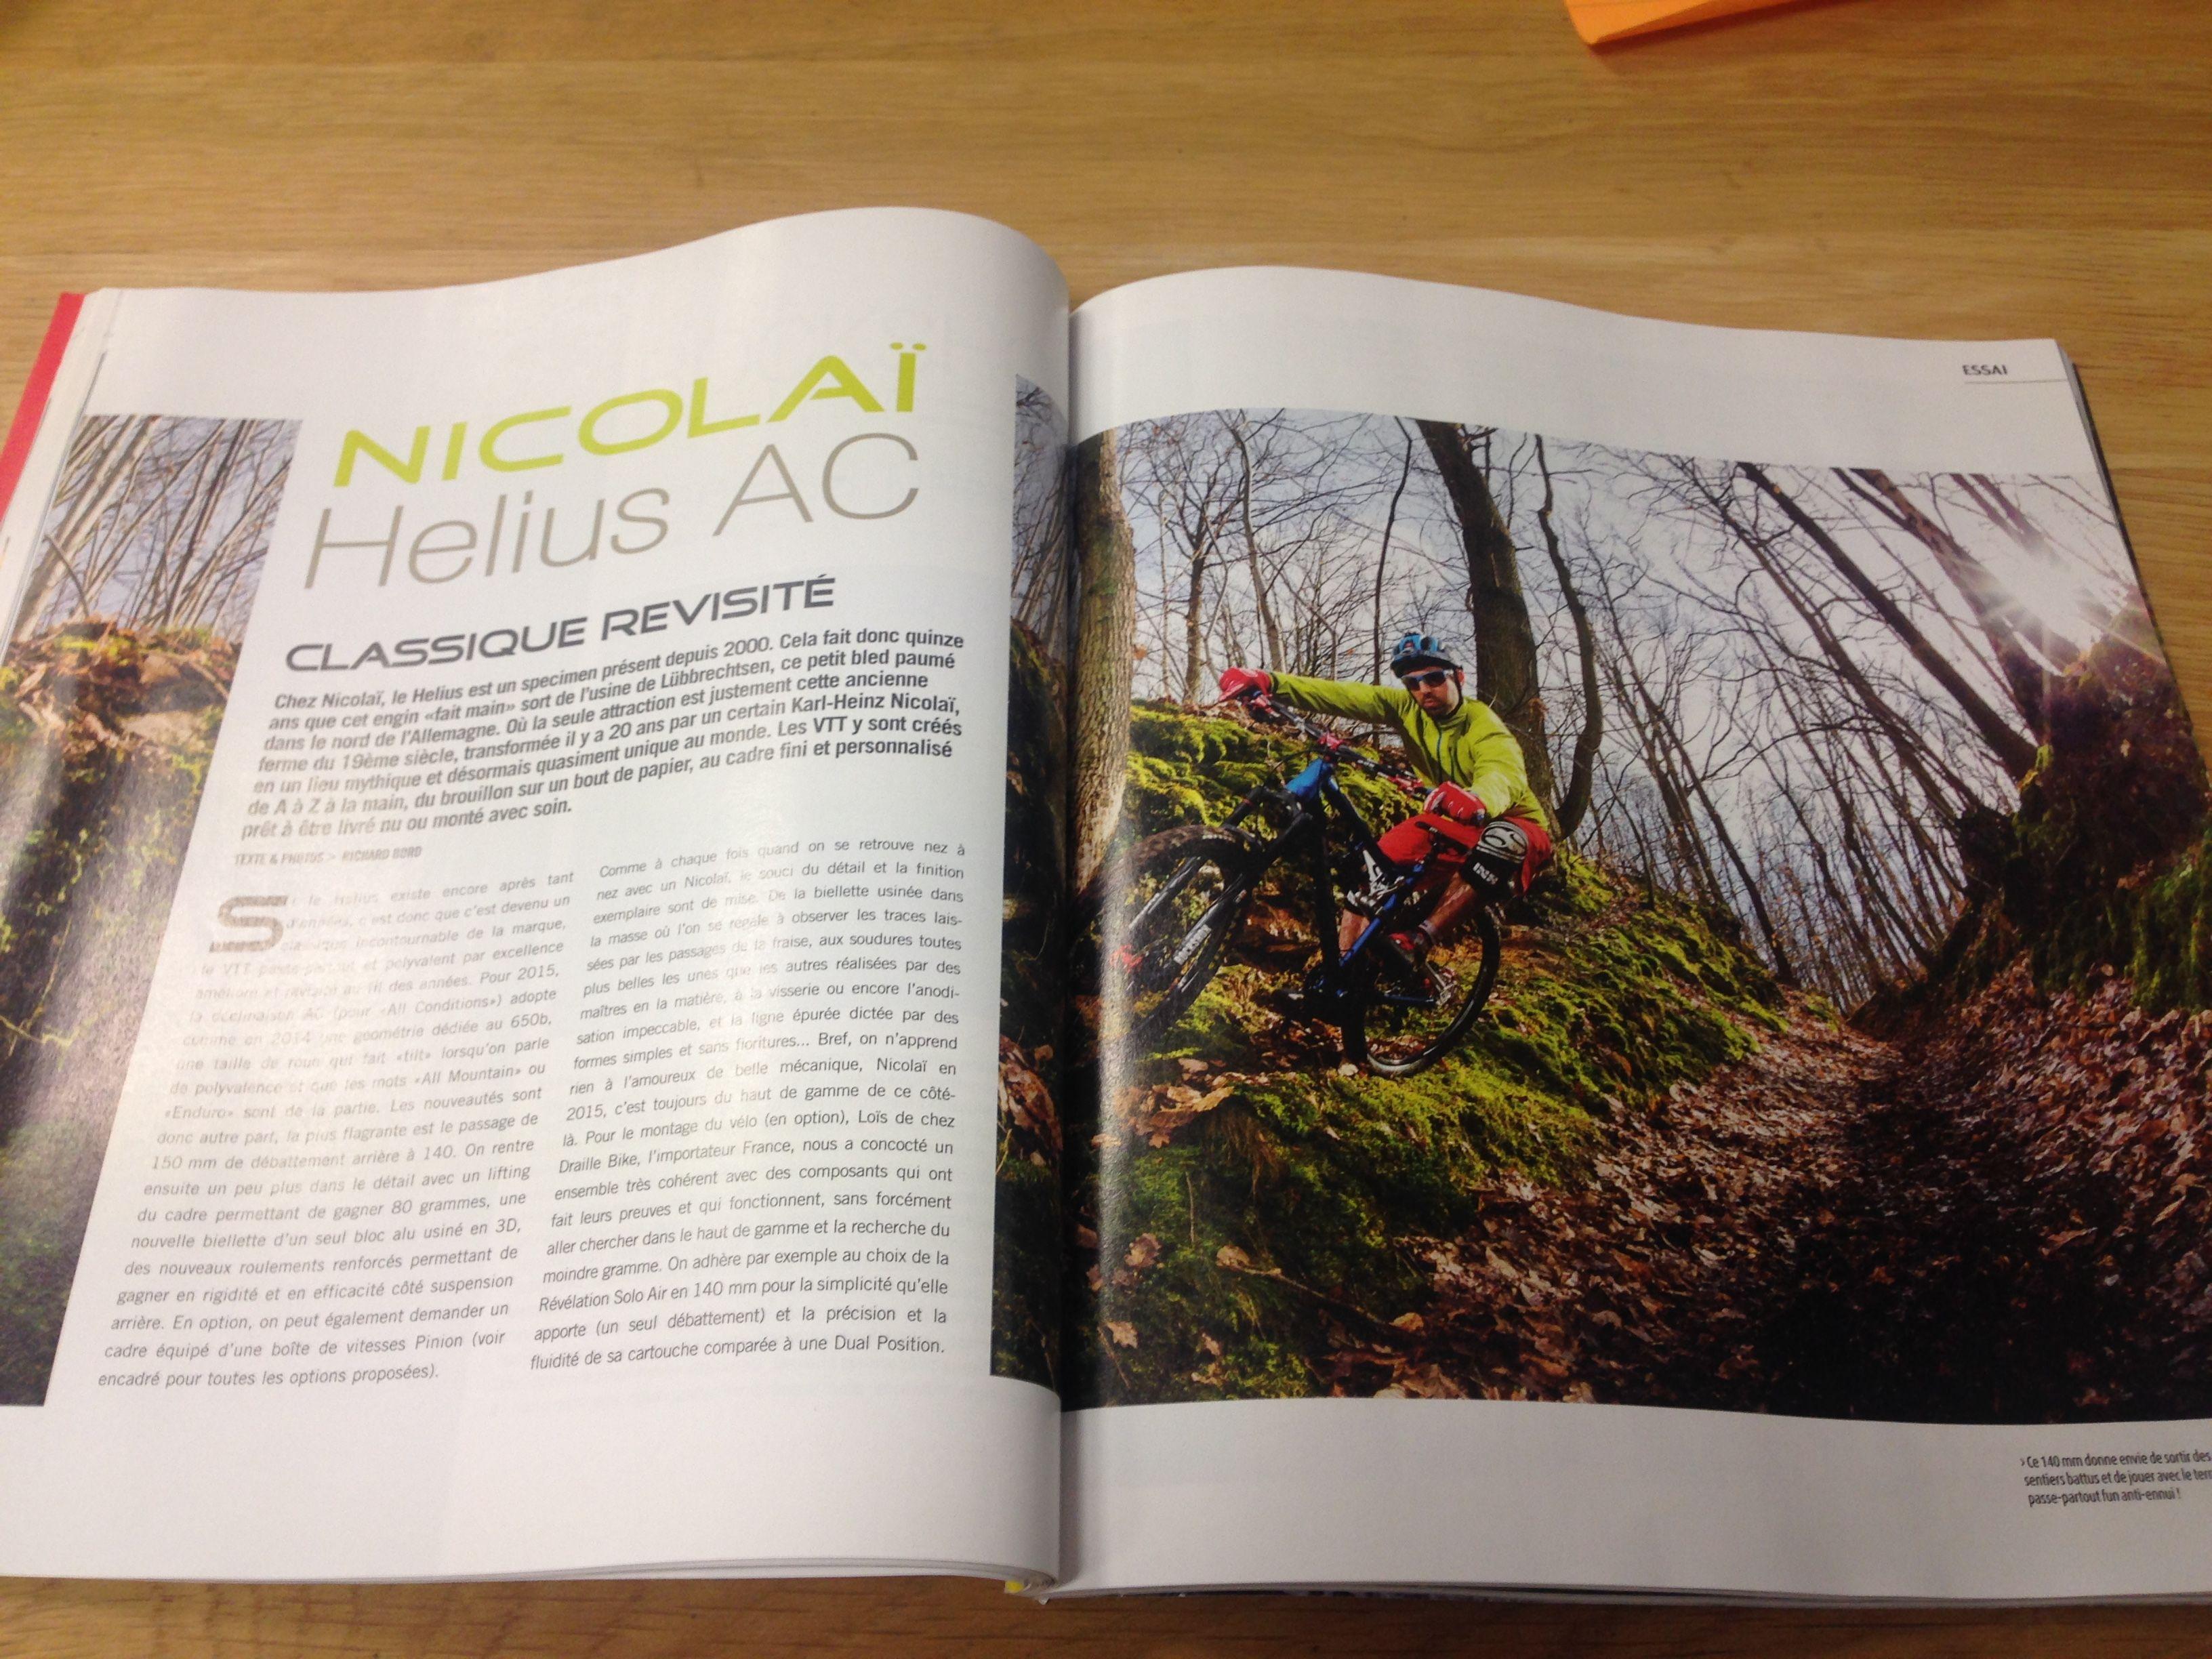 Vélo Vert Septembre 2016  #NicolaiBikes #Nicolai #HeliusAC #Velo #VTT #Bike #Test #VeloTest #BikeAndTest #CentreDeTest #paris #Yvelines …